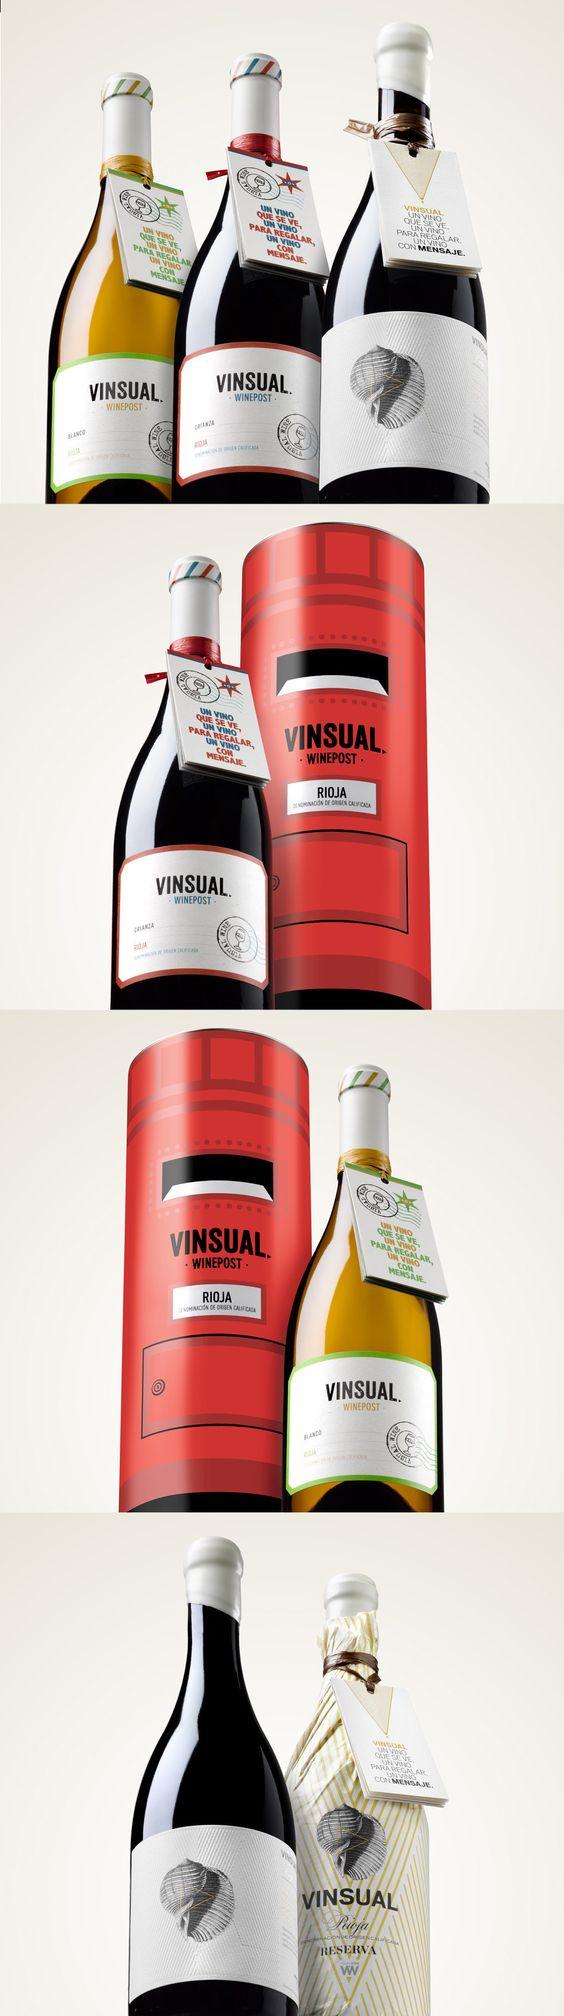 Vinsual Wine Rioja Spain Taninotanino Wine Design Wine Label Design Packaging Design